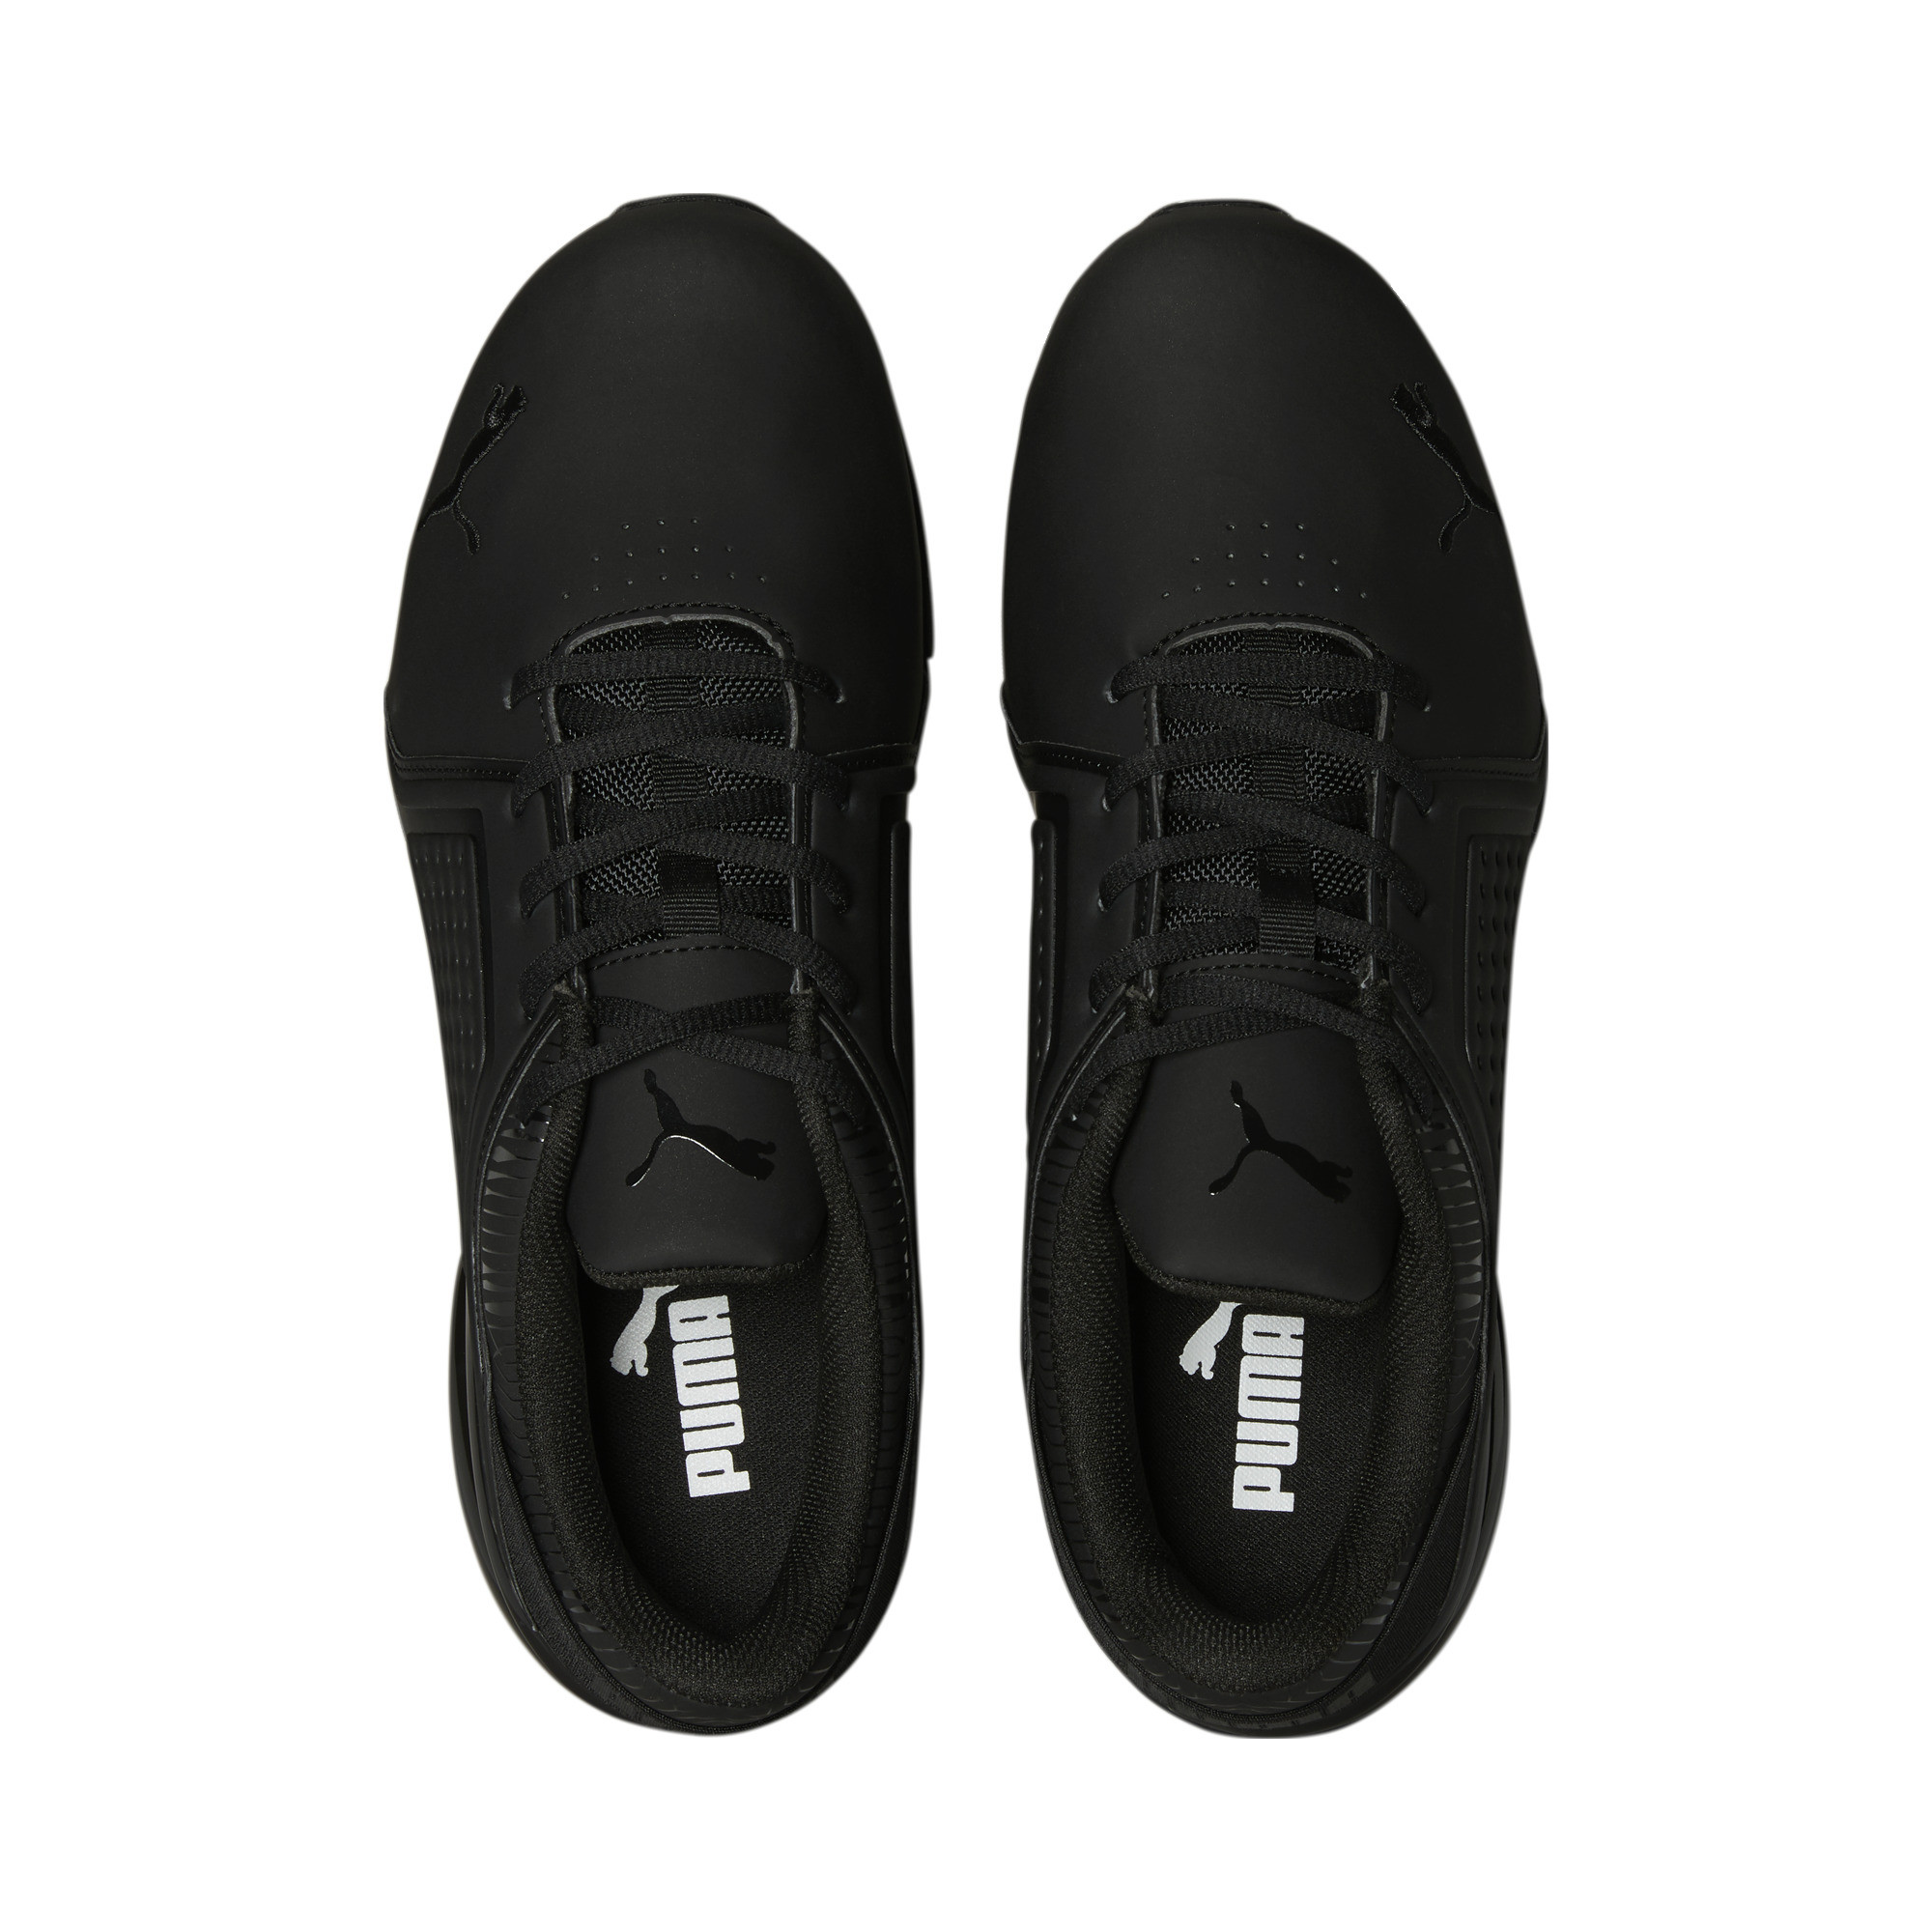 PUMA-Men-039-s-Viz-Runner-Graphic-Sneakers thumbnail 30